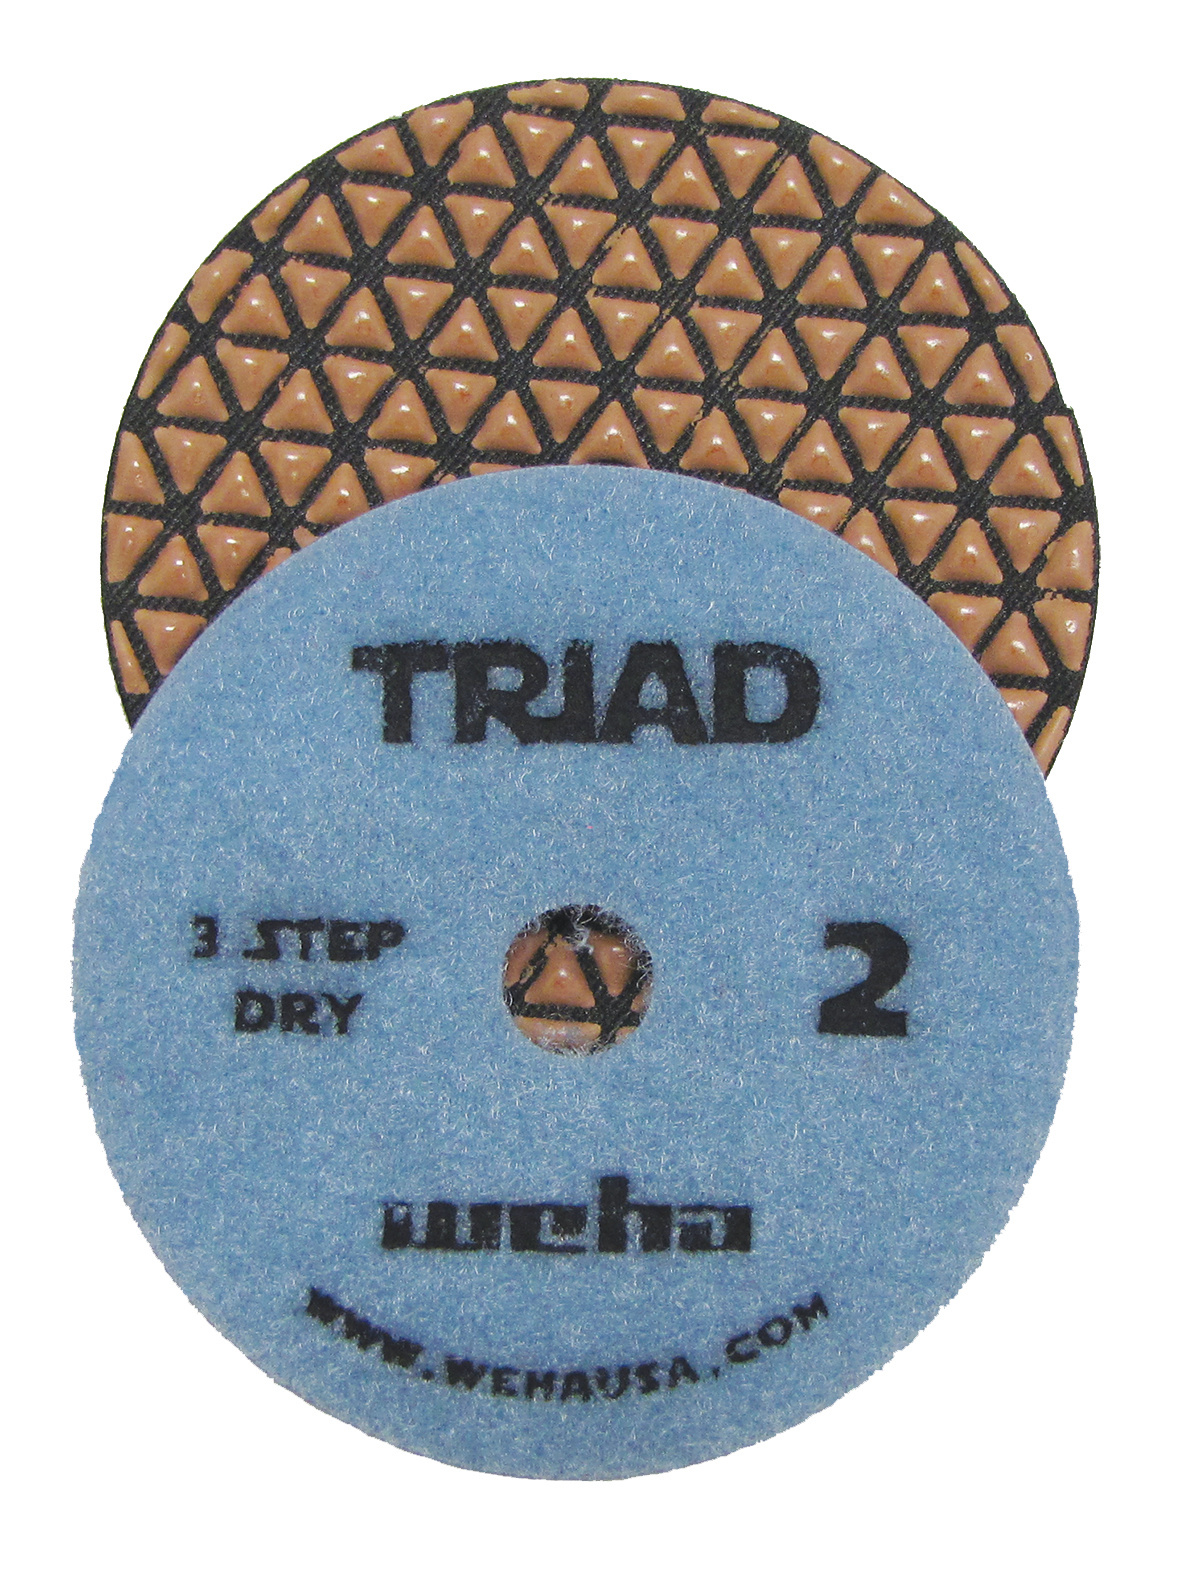 Triad Dry 3 Step Pos 2